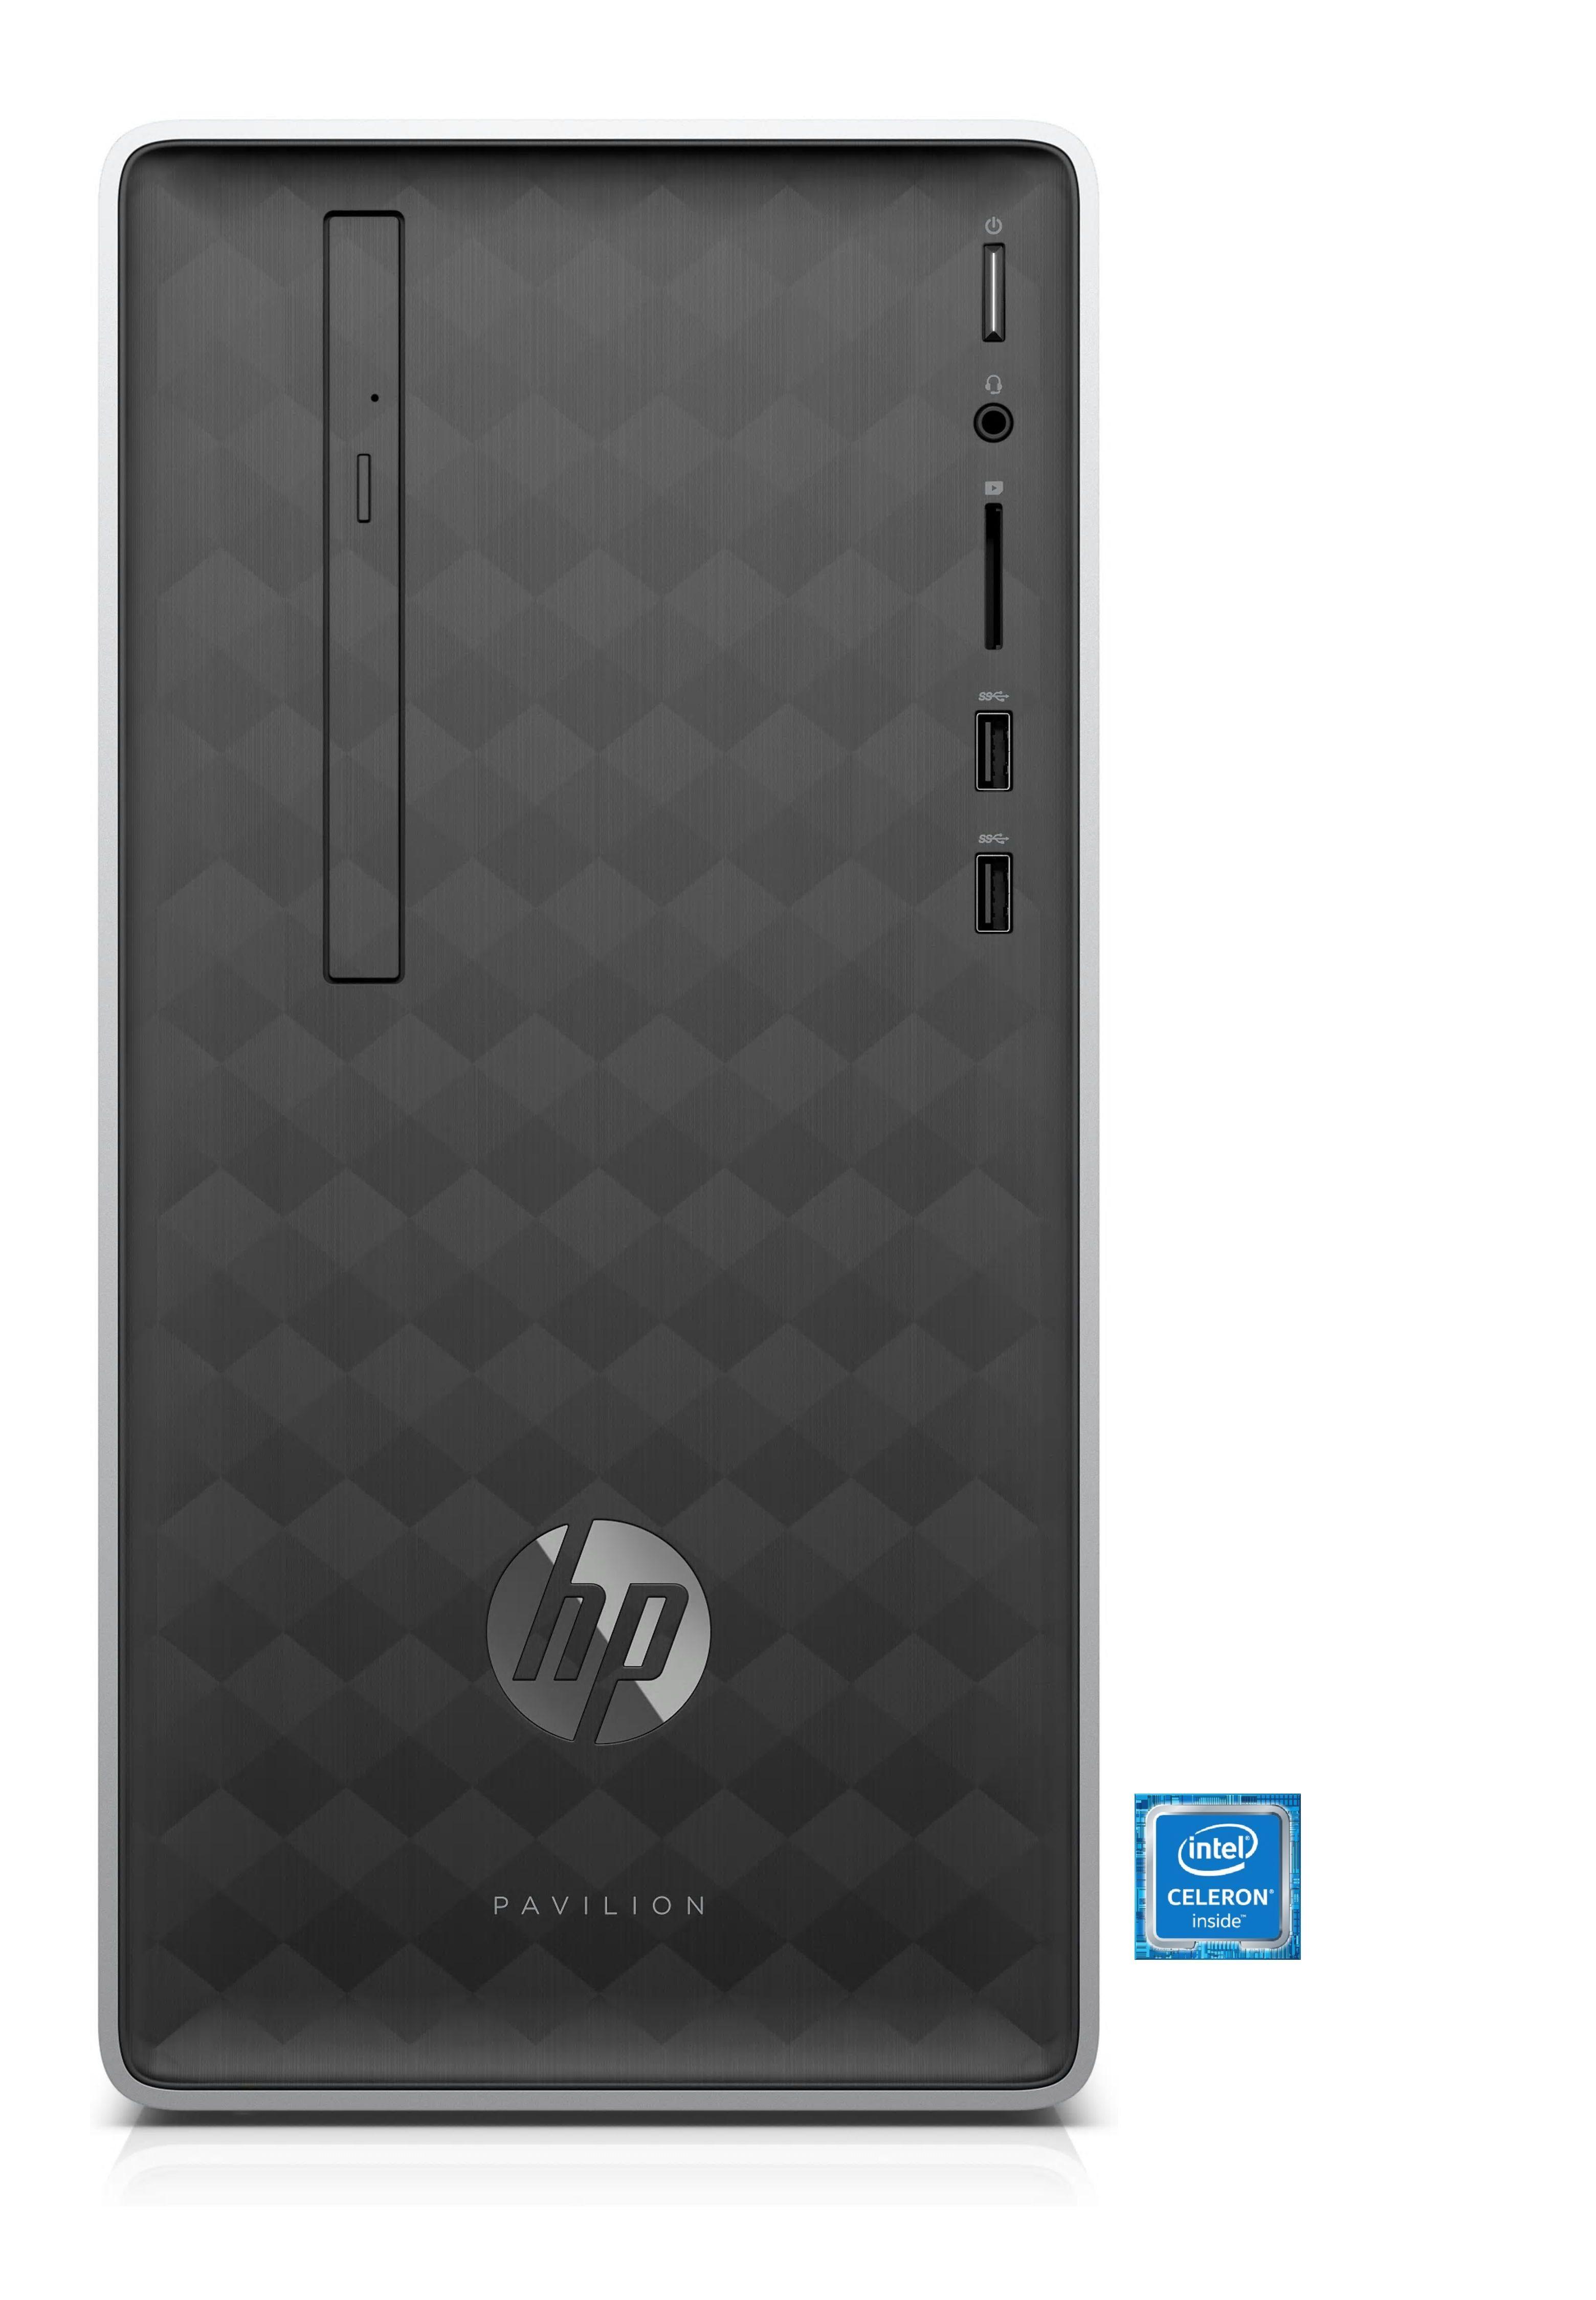 HP Pavilion 590-a0507ng Desktop PC »Intel Celeron J4005, Intel Graphics, 1 TB HDD, 4GB«